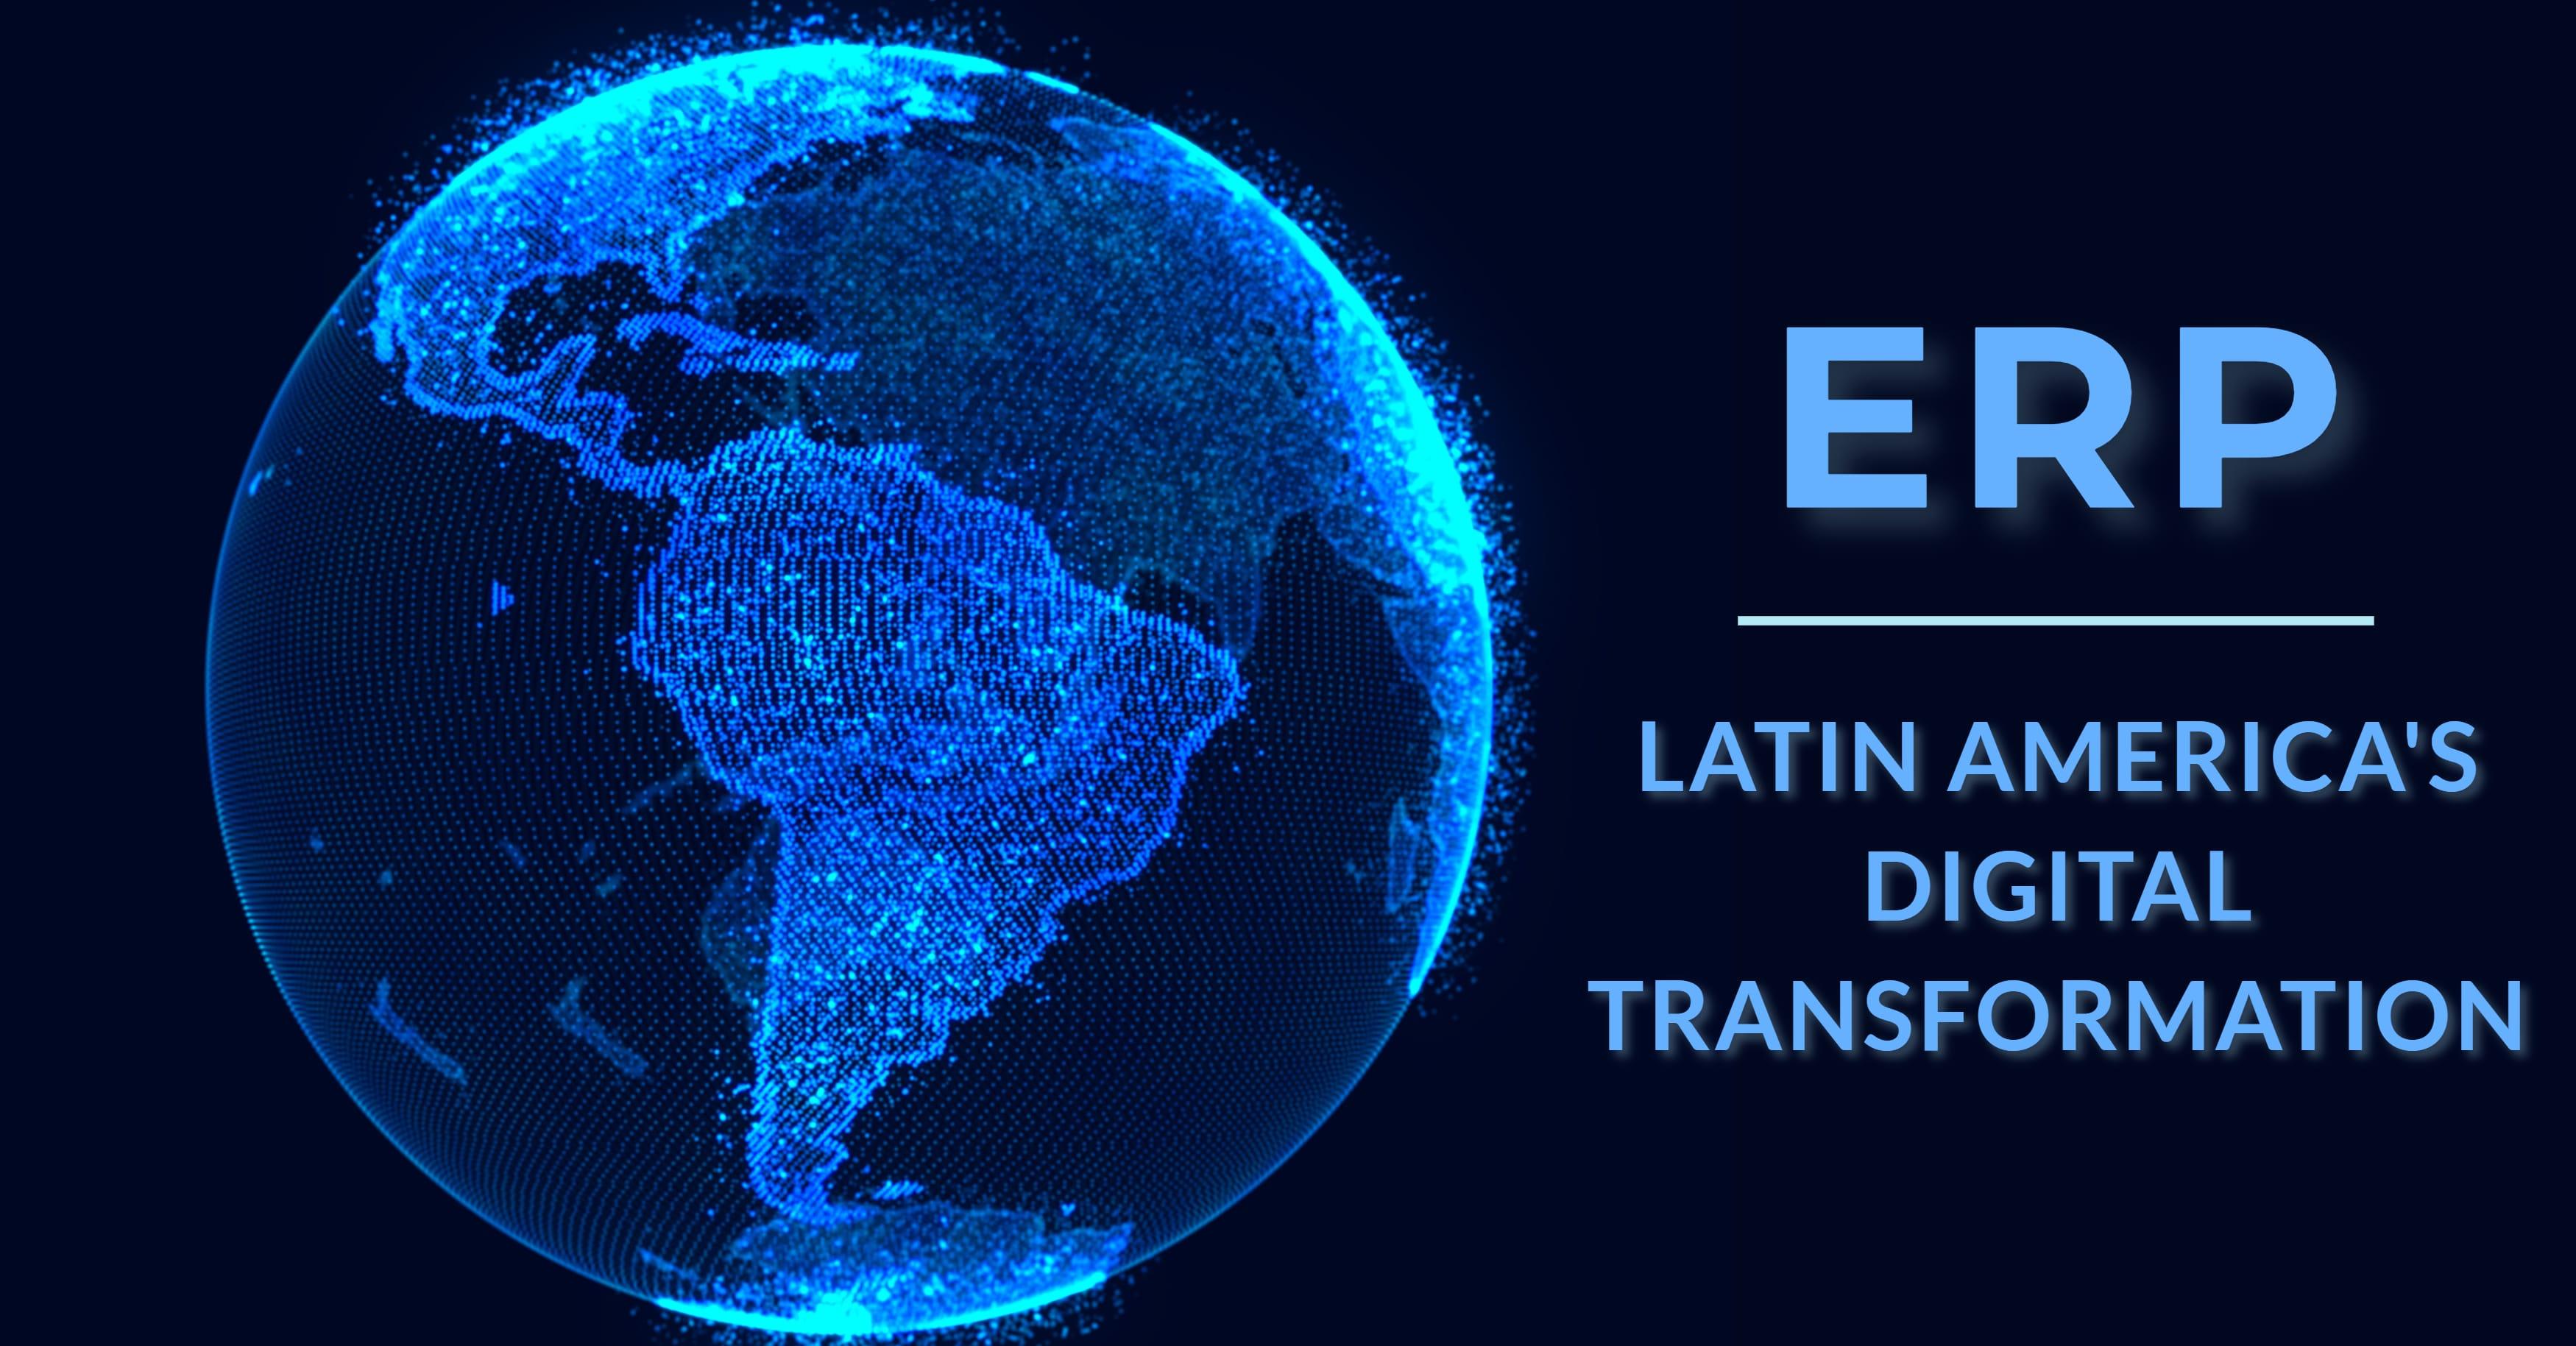 ERP Latin America